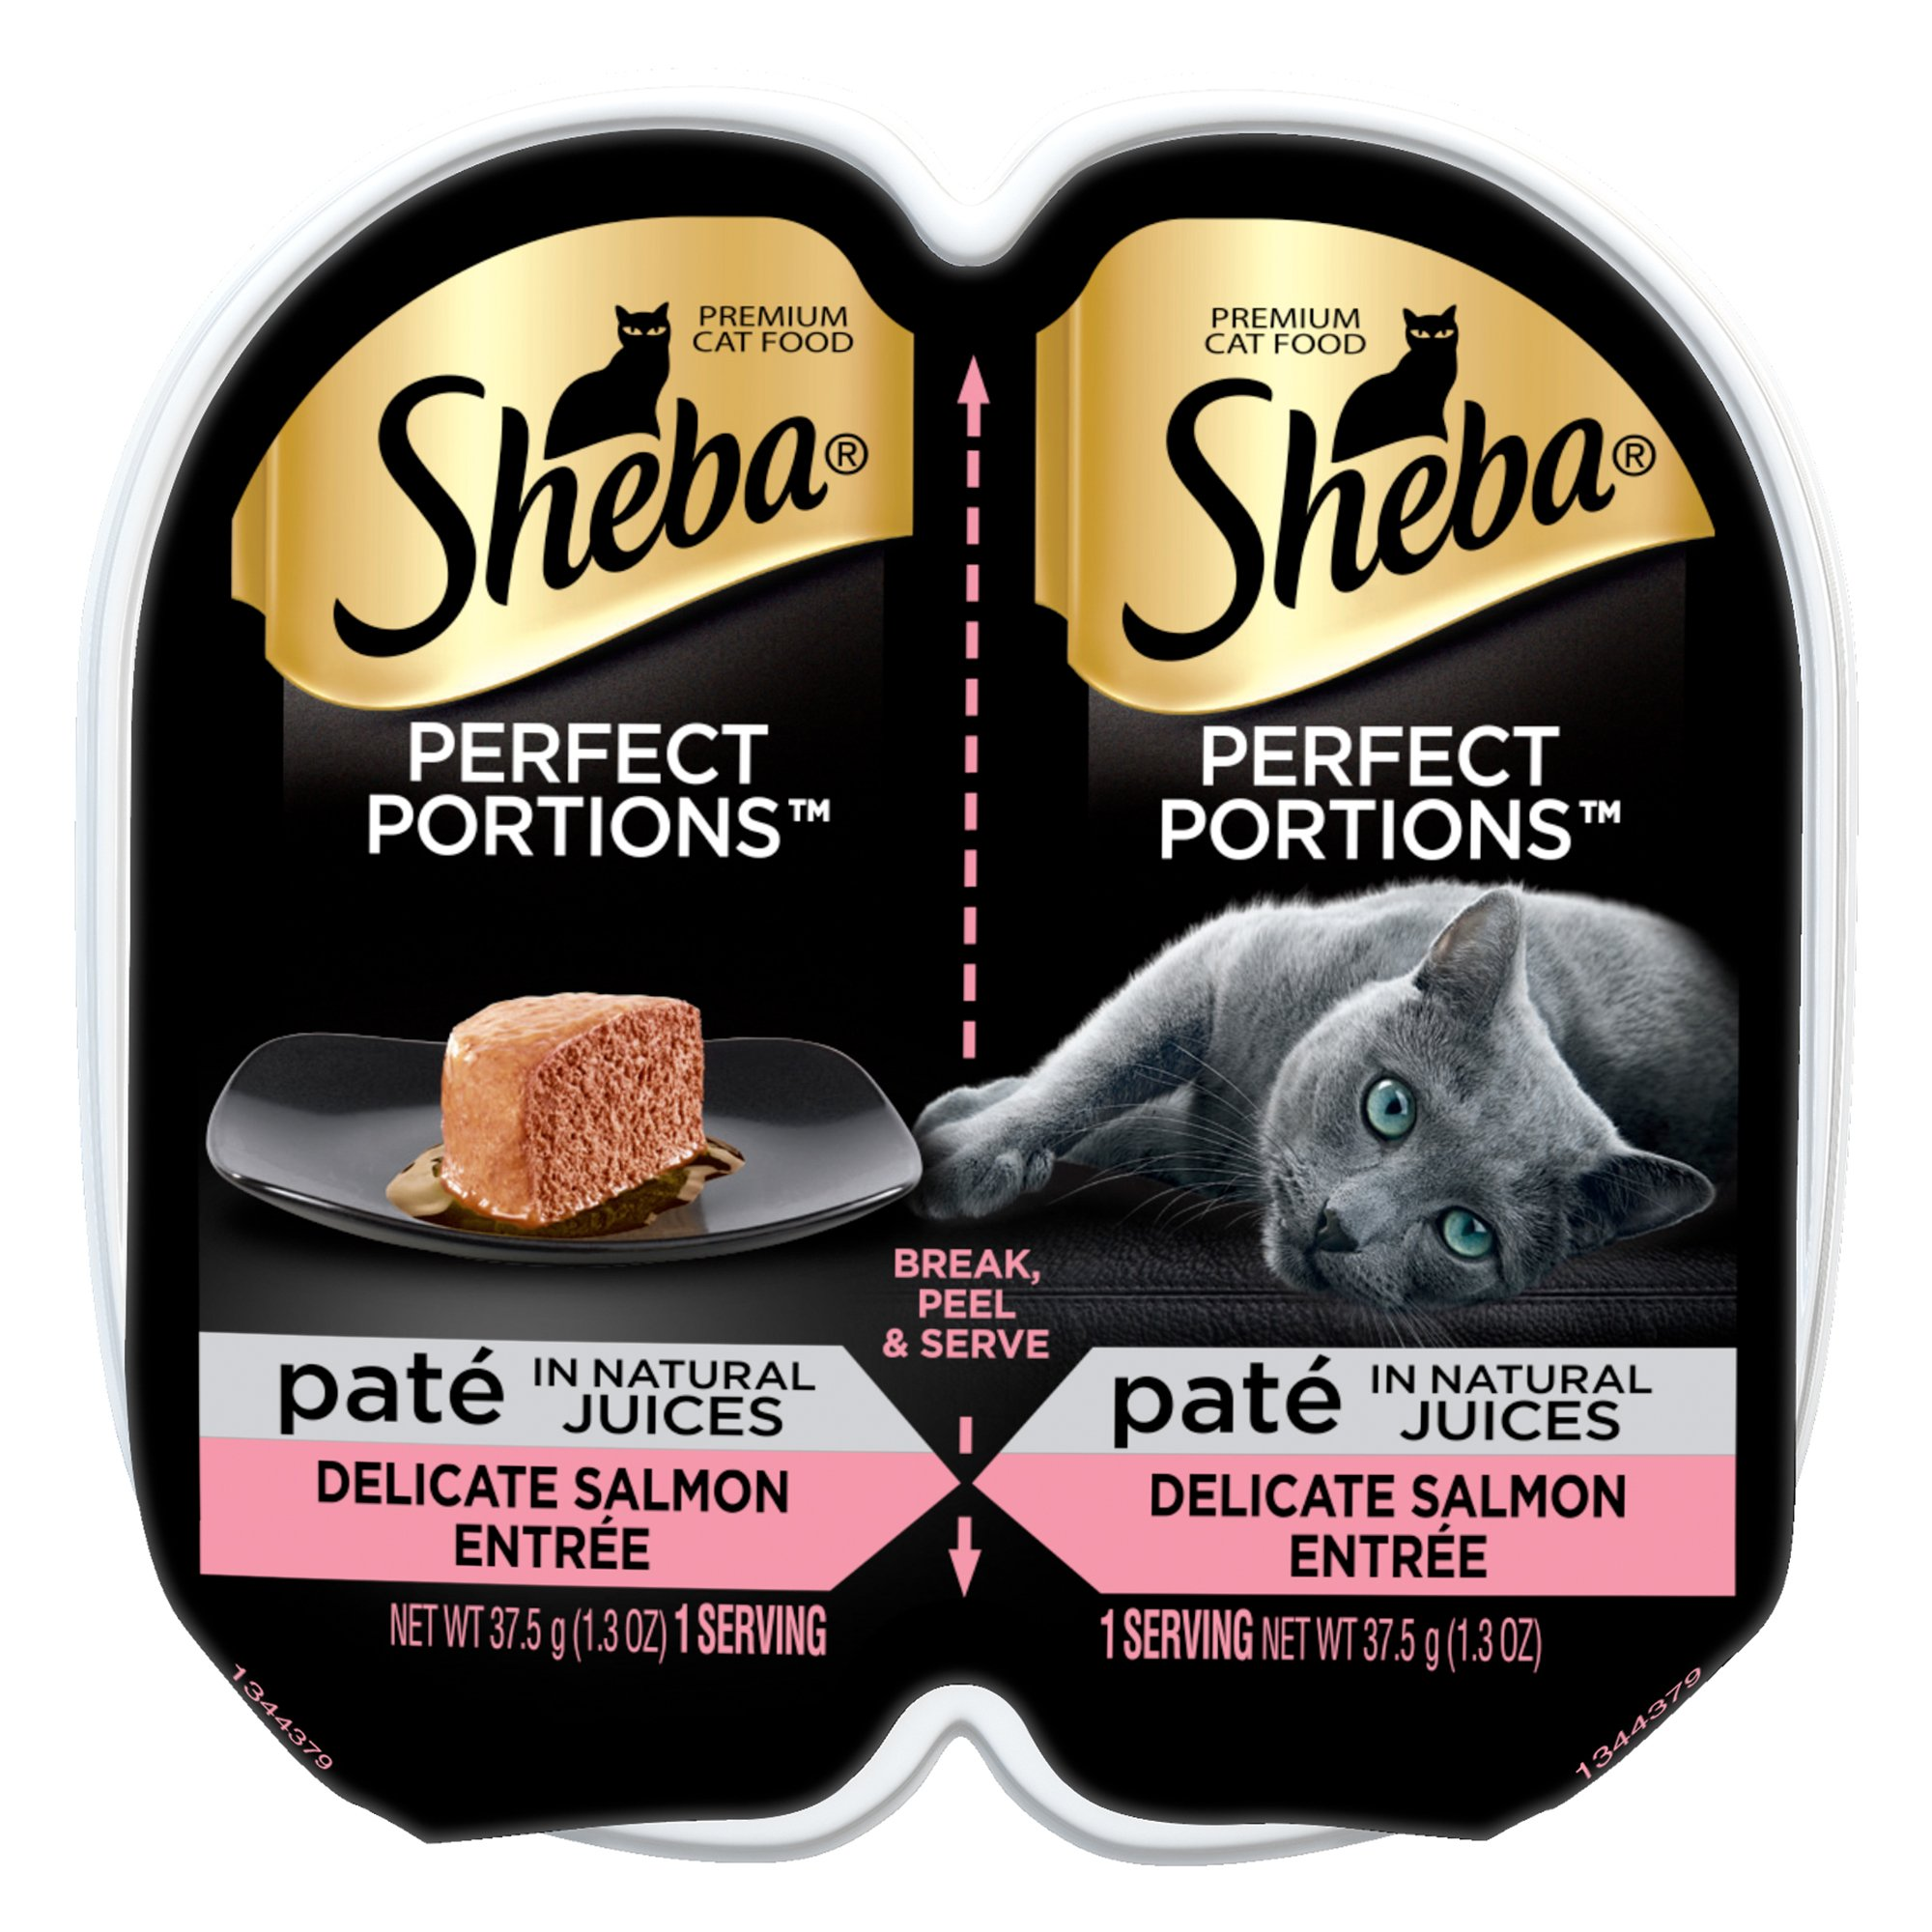 Mars Petcare Us Sheba Perfect Portions, 2.6 Oz, Premium Pate Salmon Entree Wet Cat Food (2 Pack)